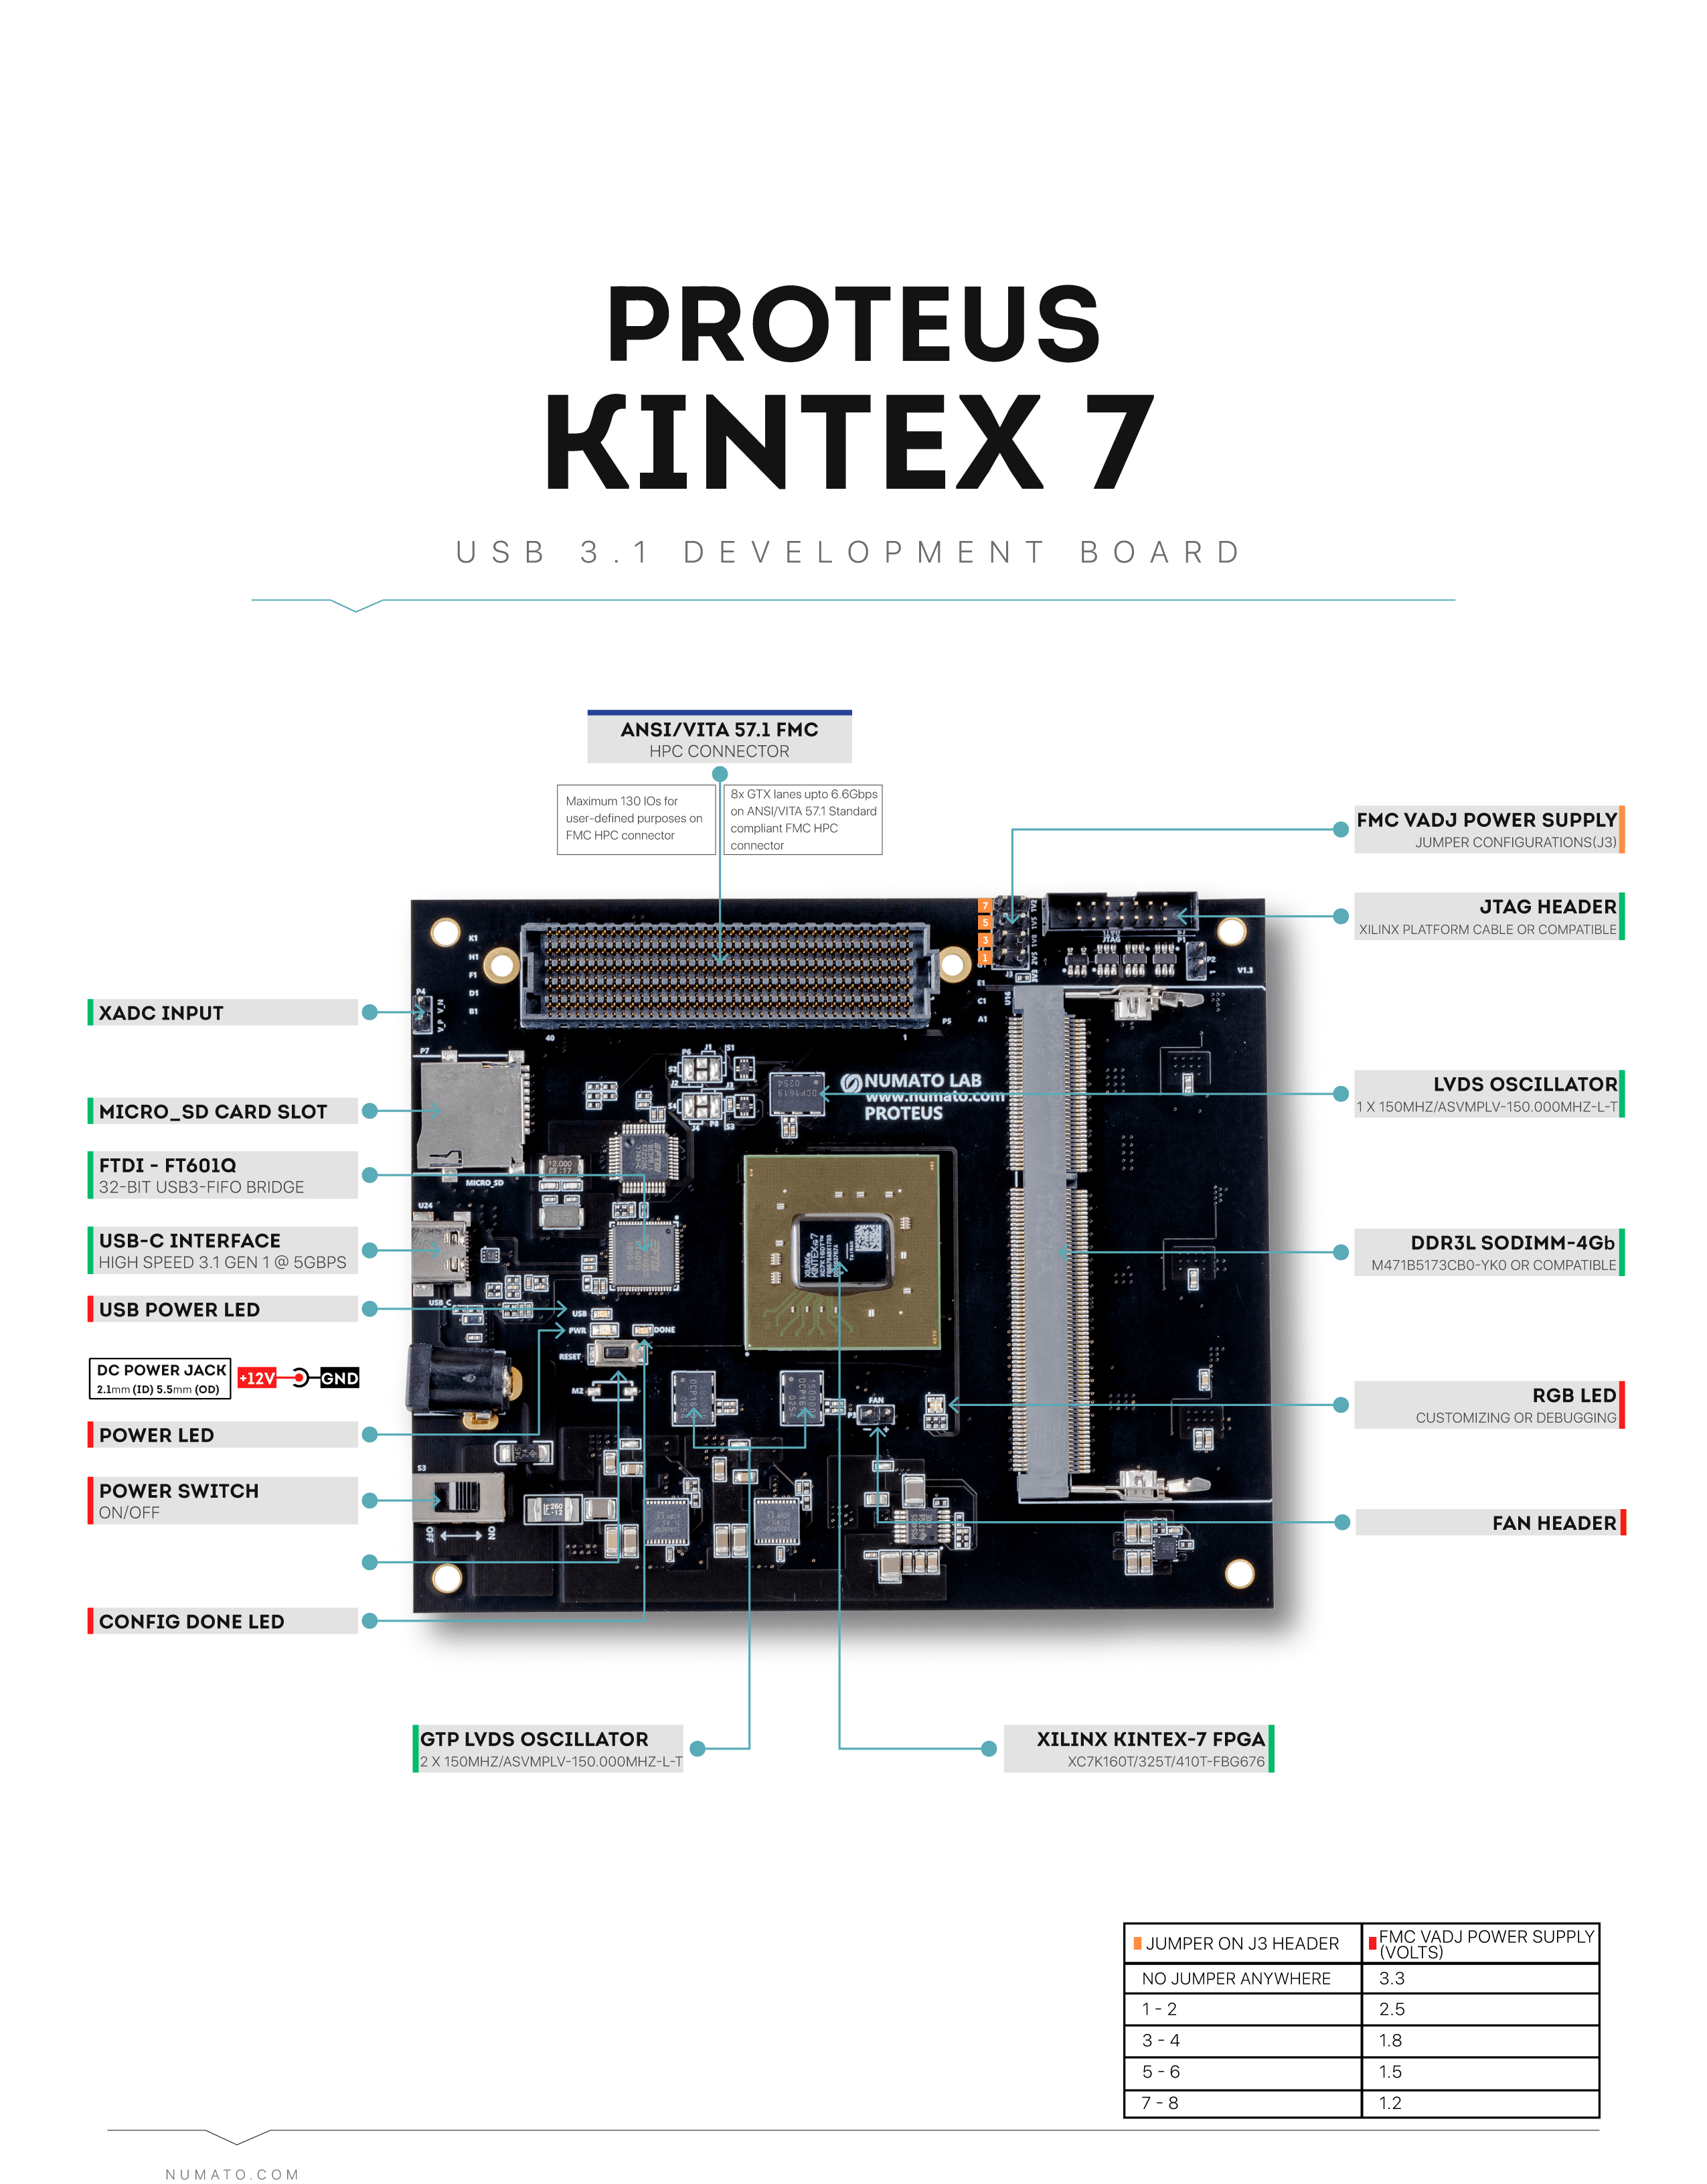 Proteus Kintex 7 USB 3 1 Development Board